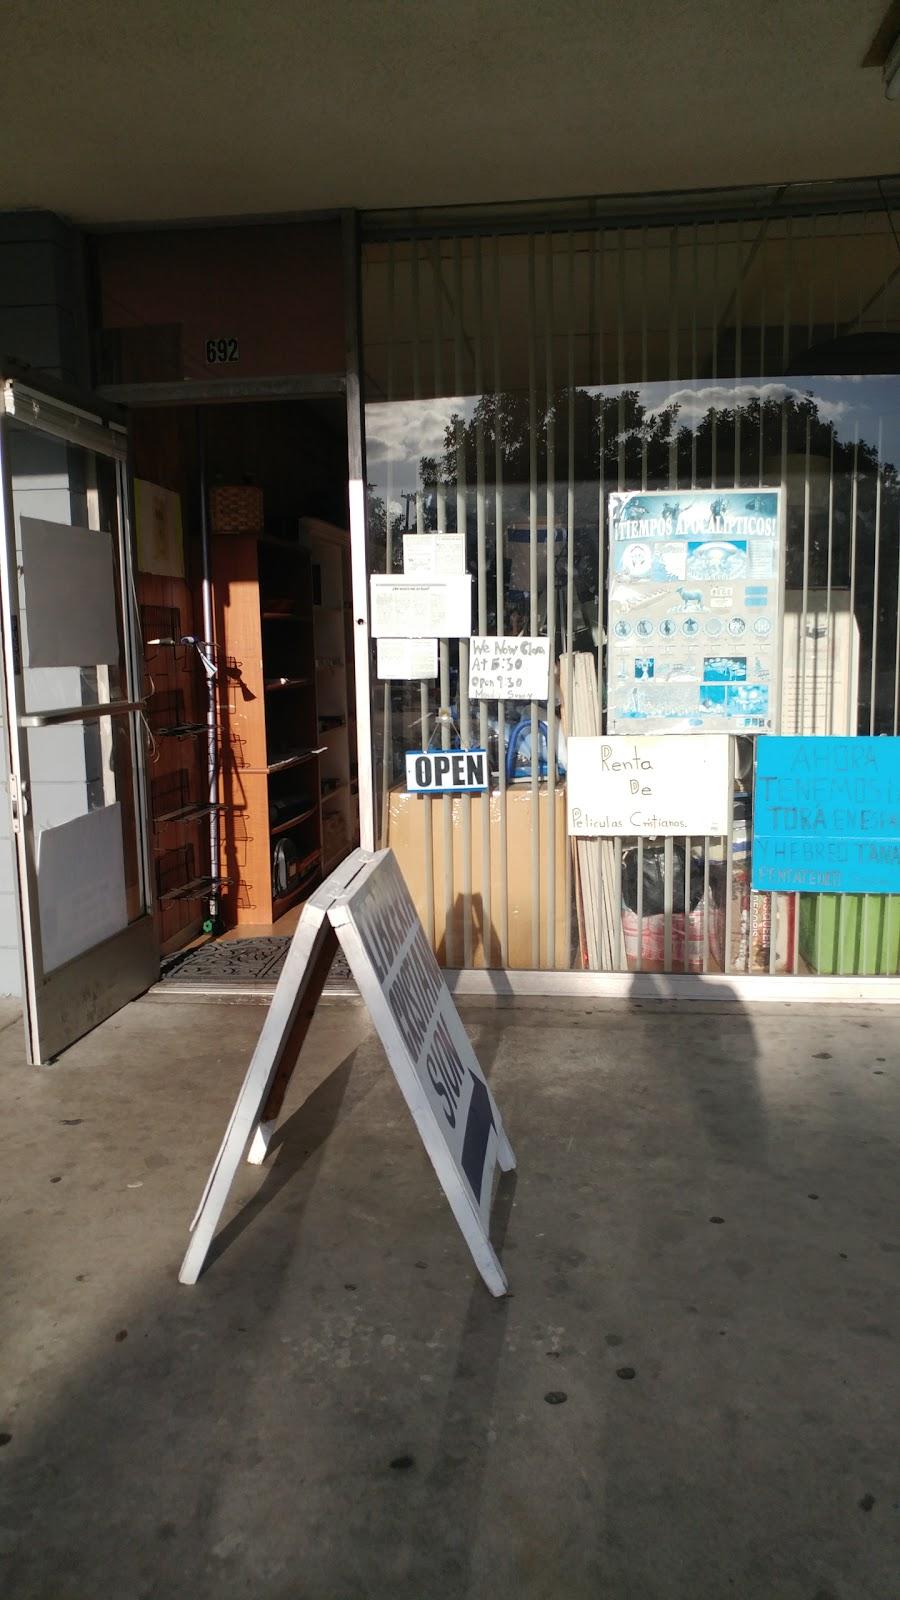 Libreria Cristiana Sion - library  | Photo 2 of 2 | Address: 692 E Commonwealth Ave, Fullerton, CA 92831, USA | Phone: (714) 578-0025